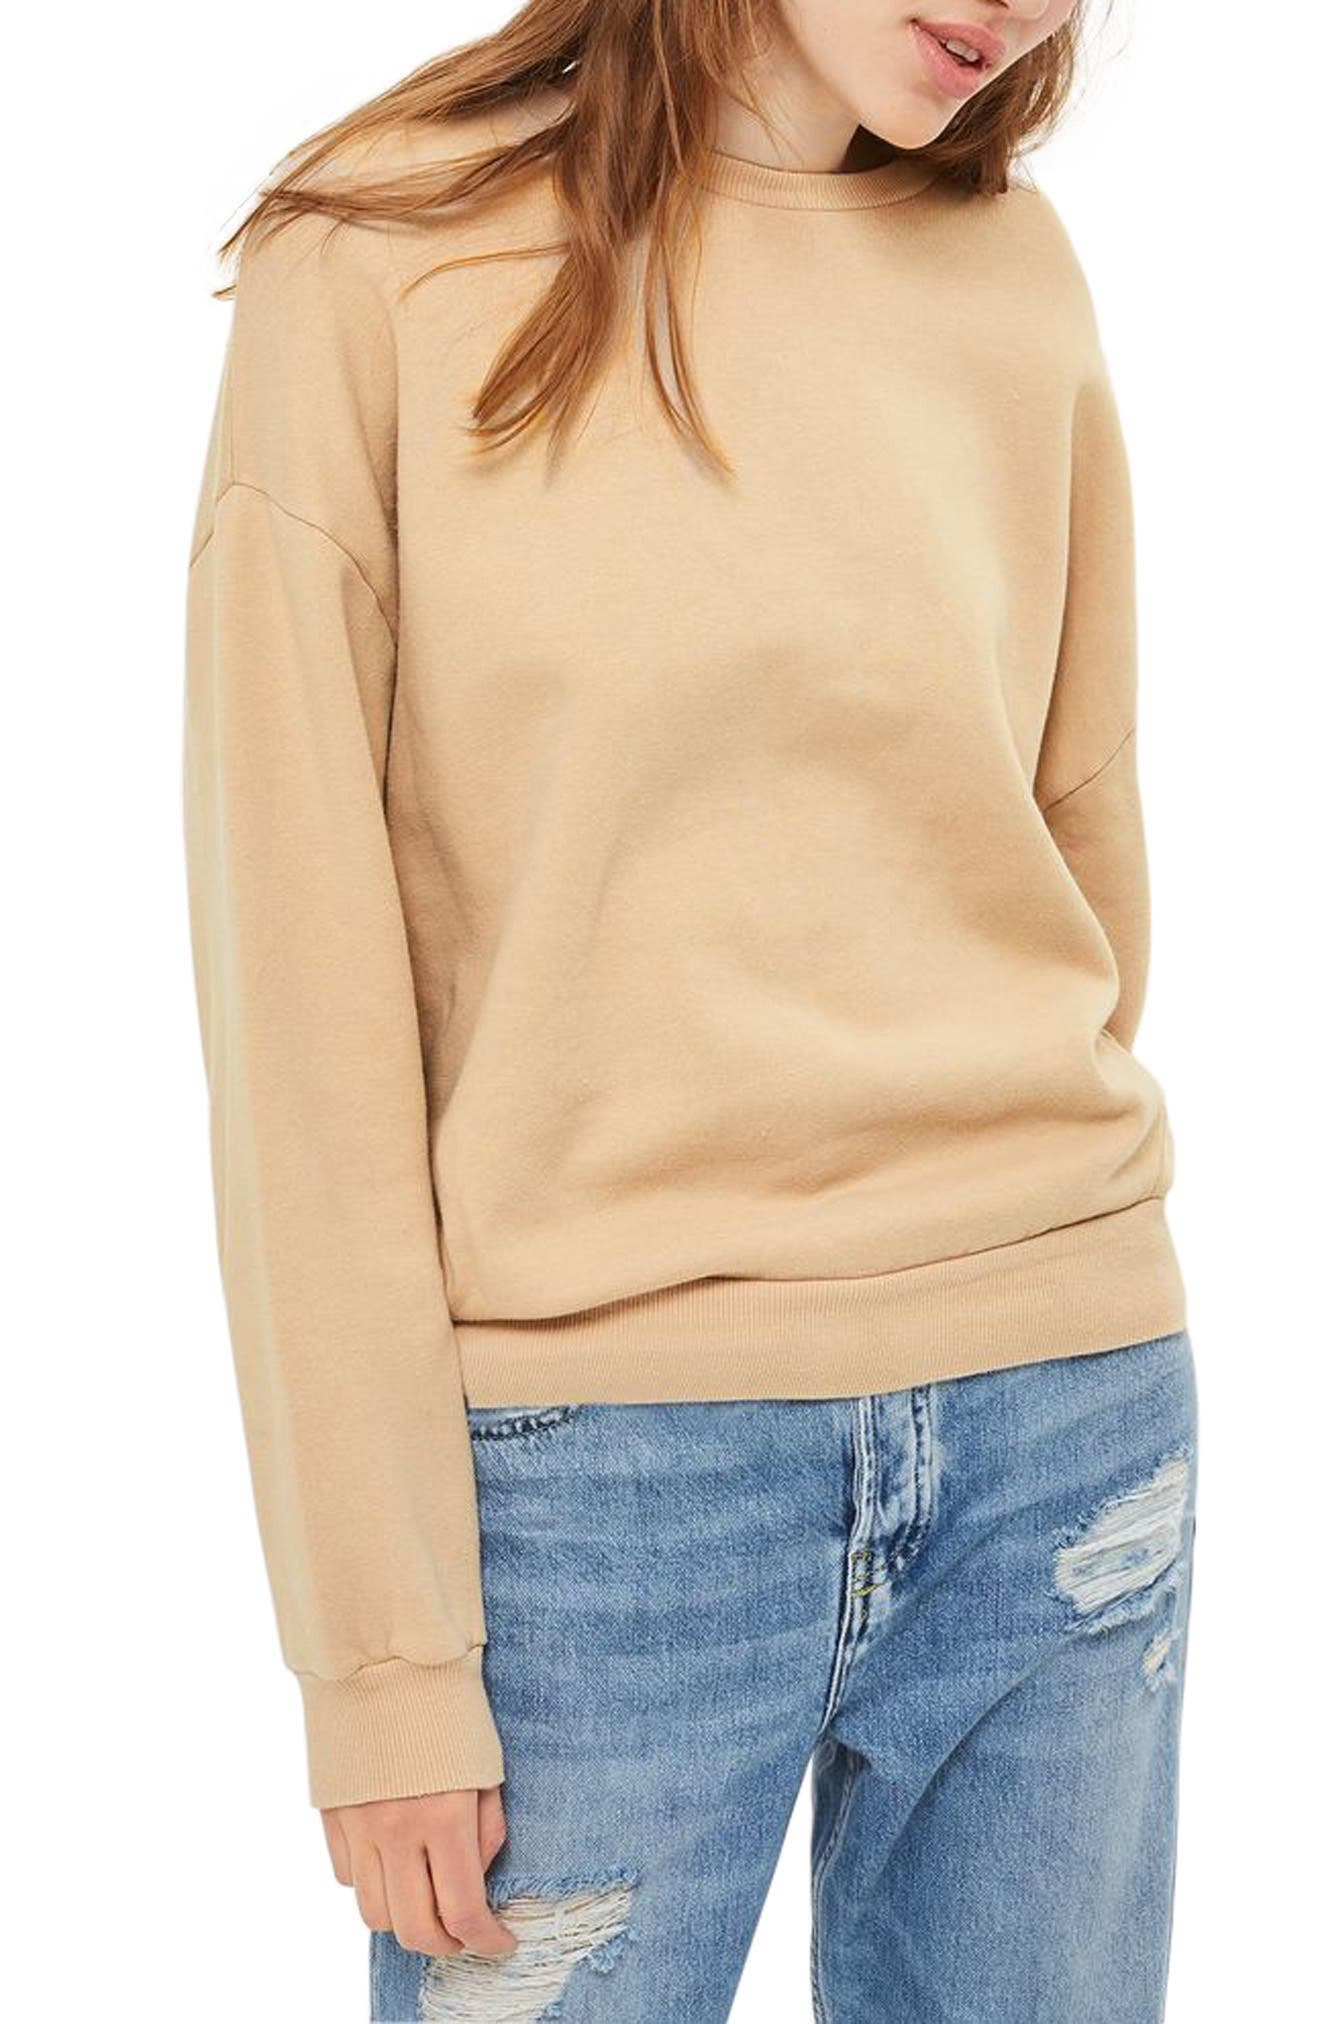 Topshop Sloppy Sweatshirt